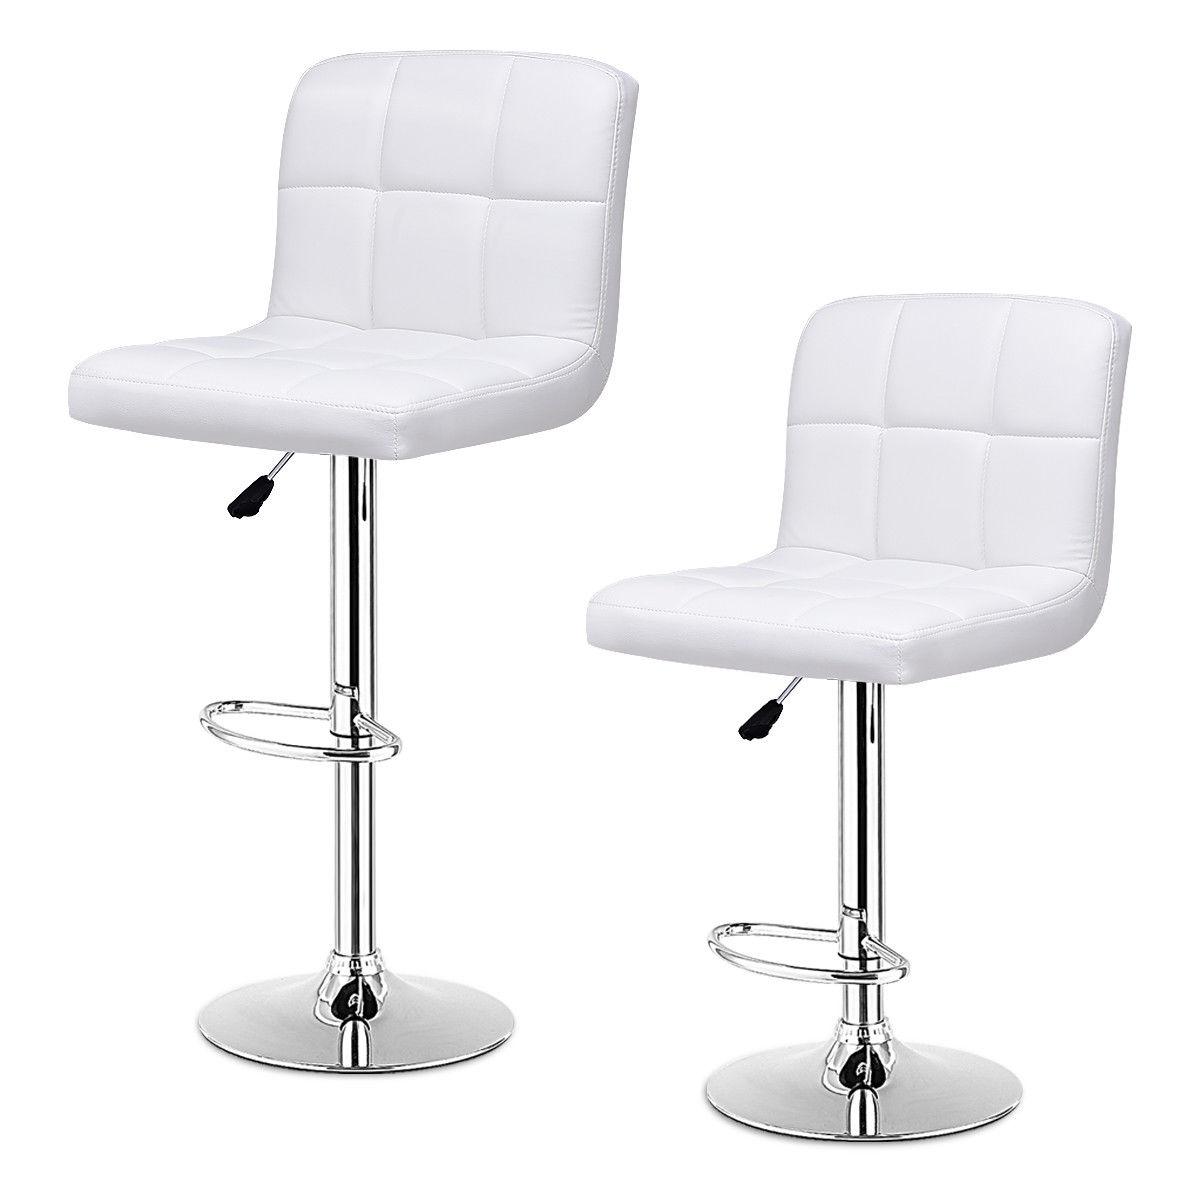 Set Of 2 Bar Stools PU Leather Adjustable Barstool Swivel Pub Chairs White - image 3 de 10